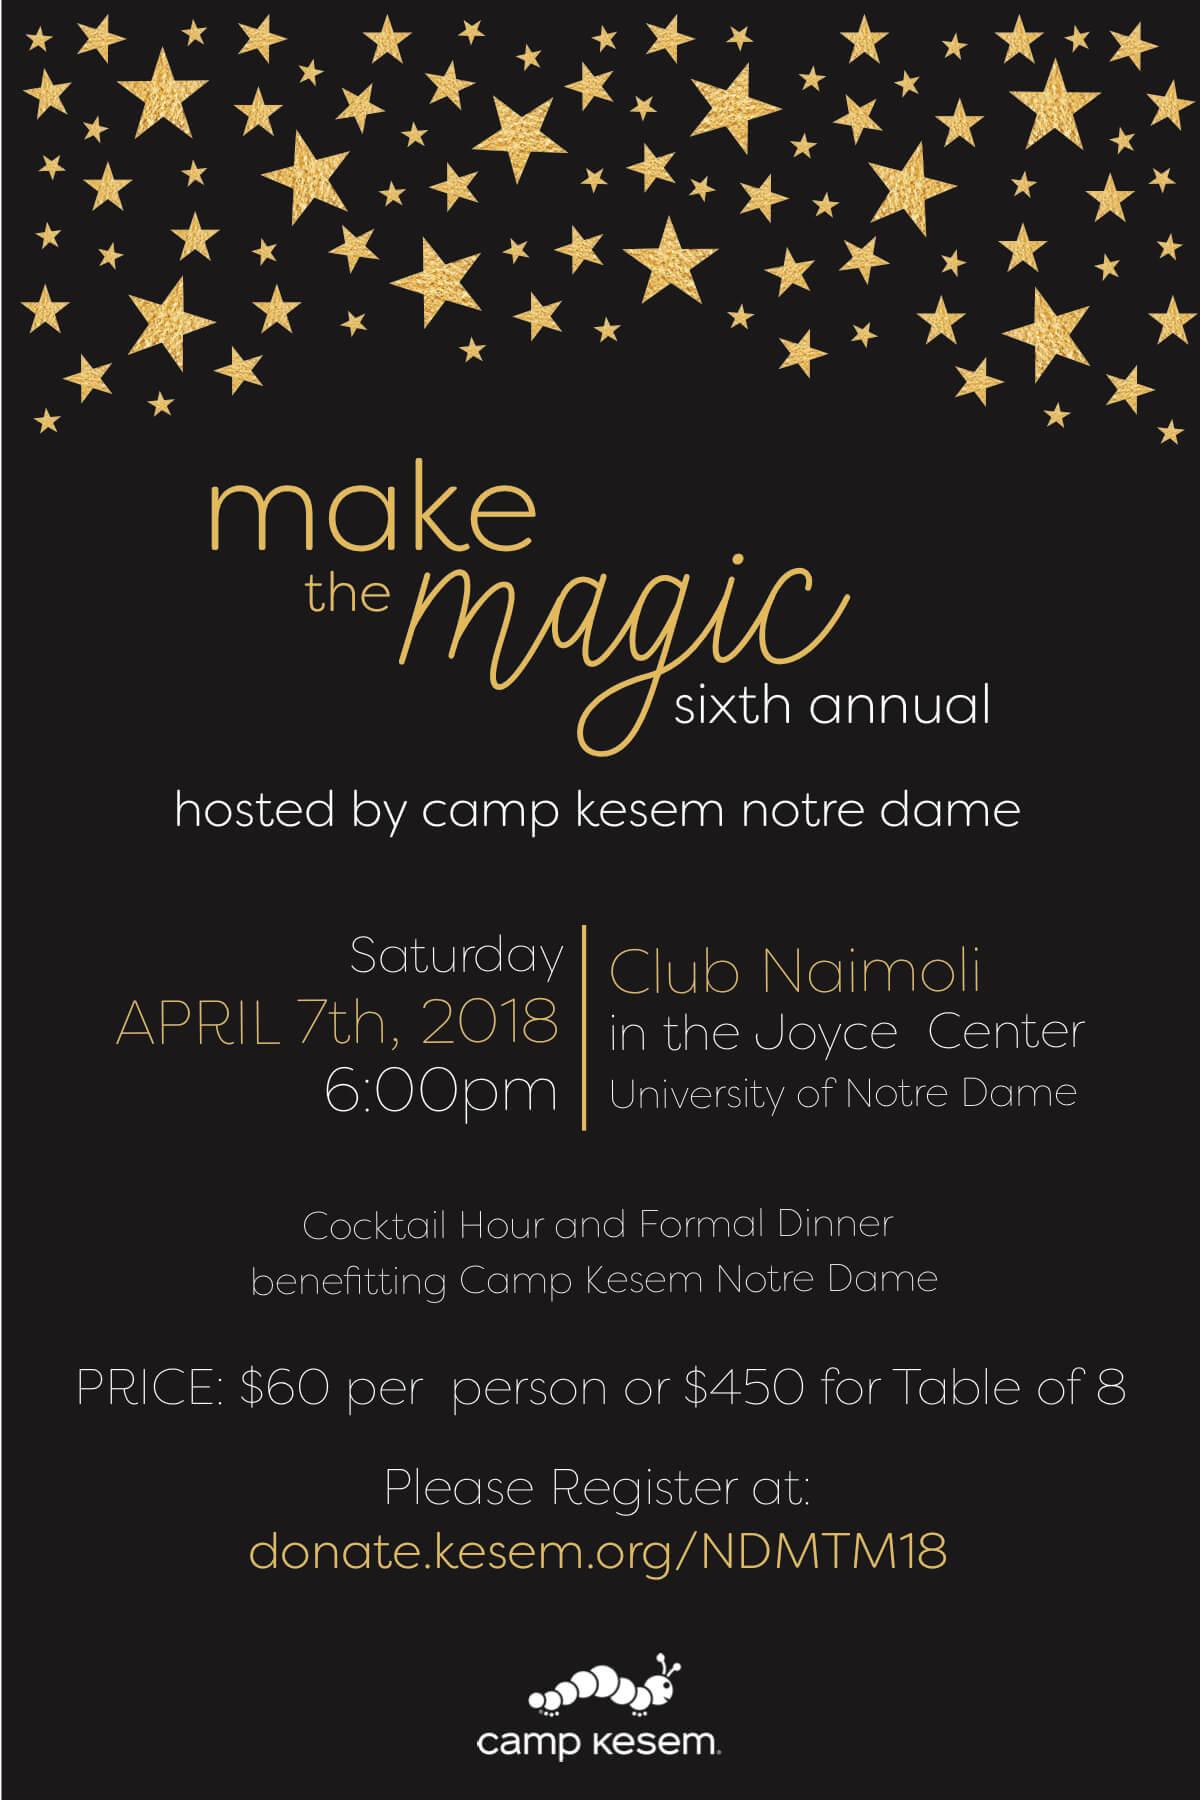 Sixth Annual Make the Magic Event